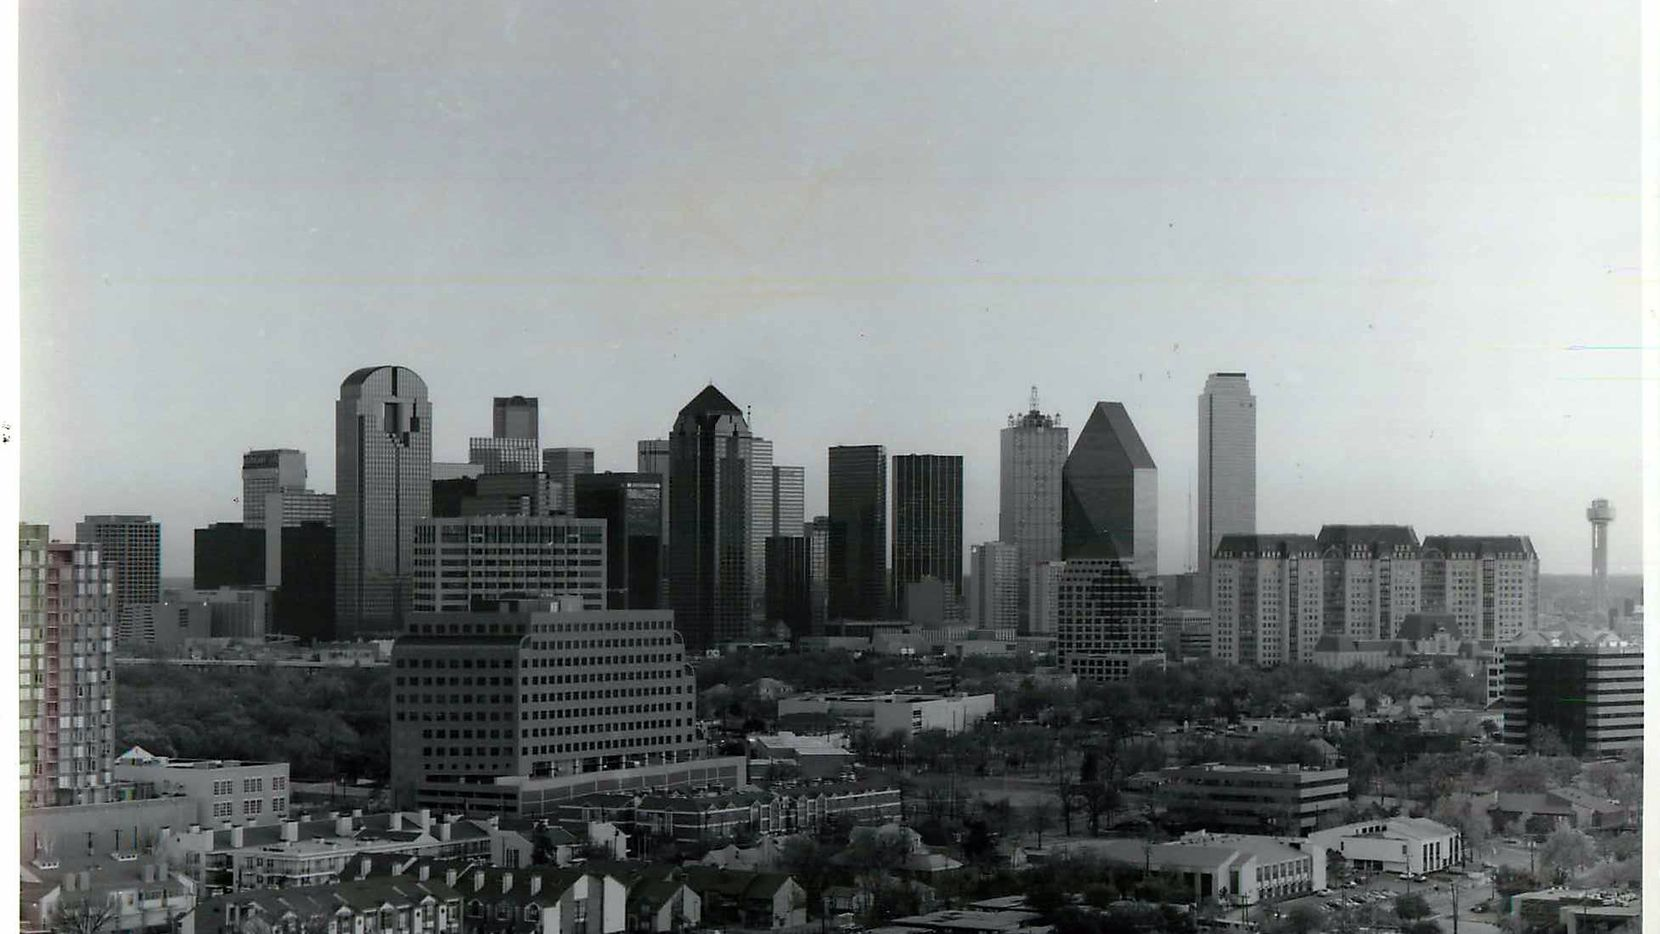 Shot November 30, 1987 - Dallas skyline [ state thomas / uptown neighborhood visible in foreground ]